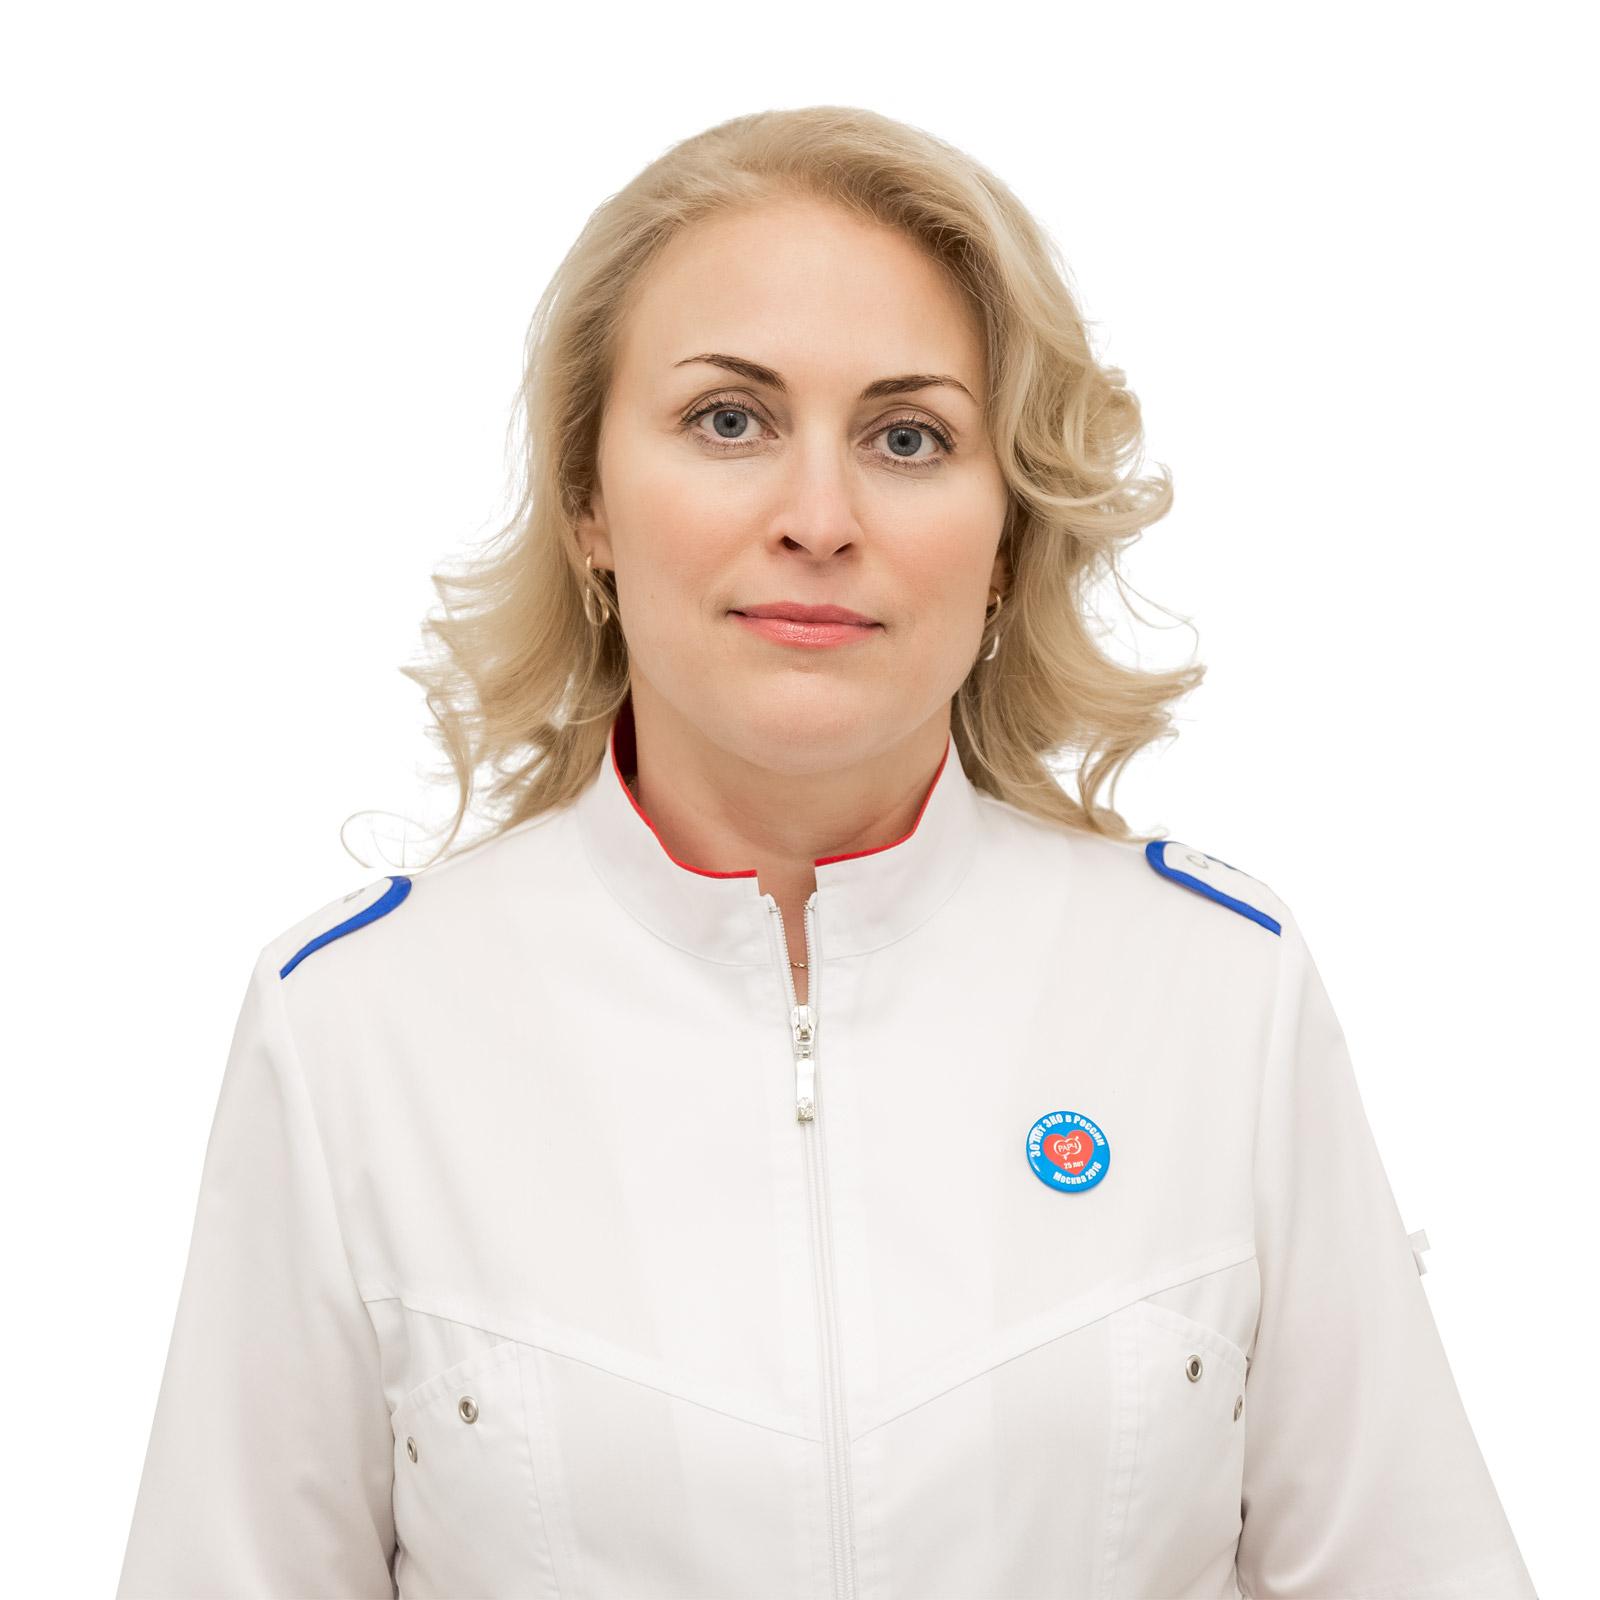 Эрлихман Надежда Марковна